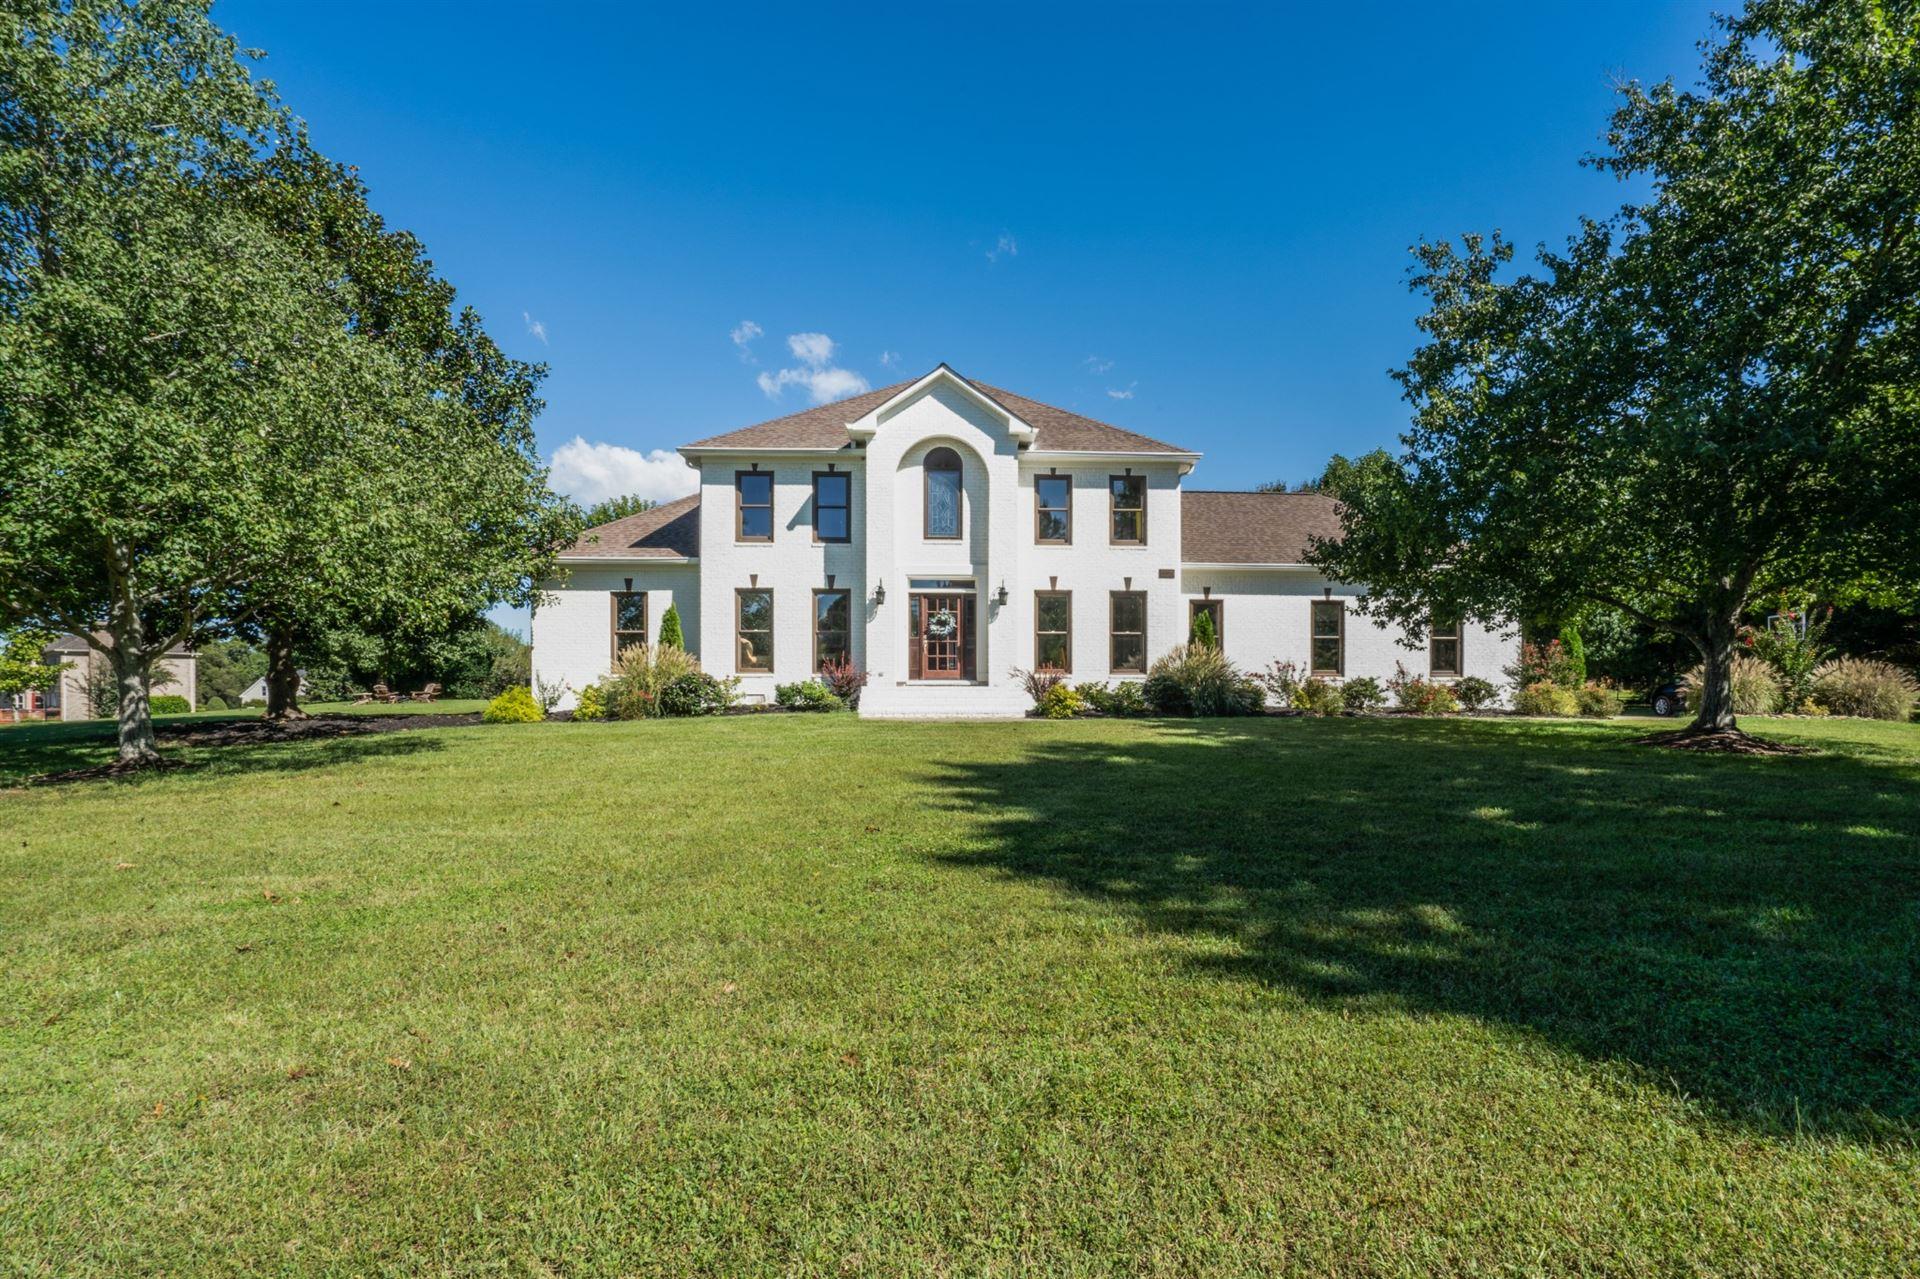 9302 Glengarry Lane, Brentwood, TN 37027 - MLS#: 2293848